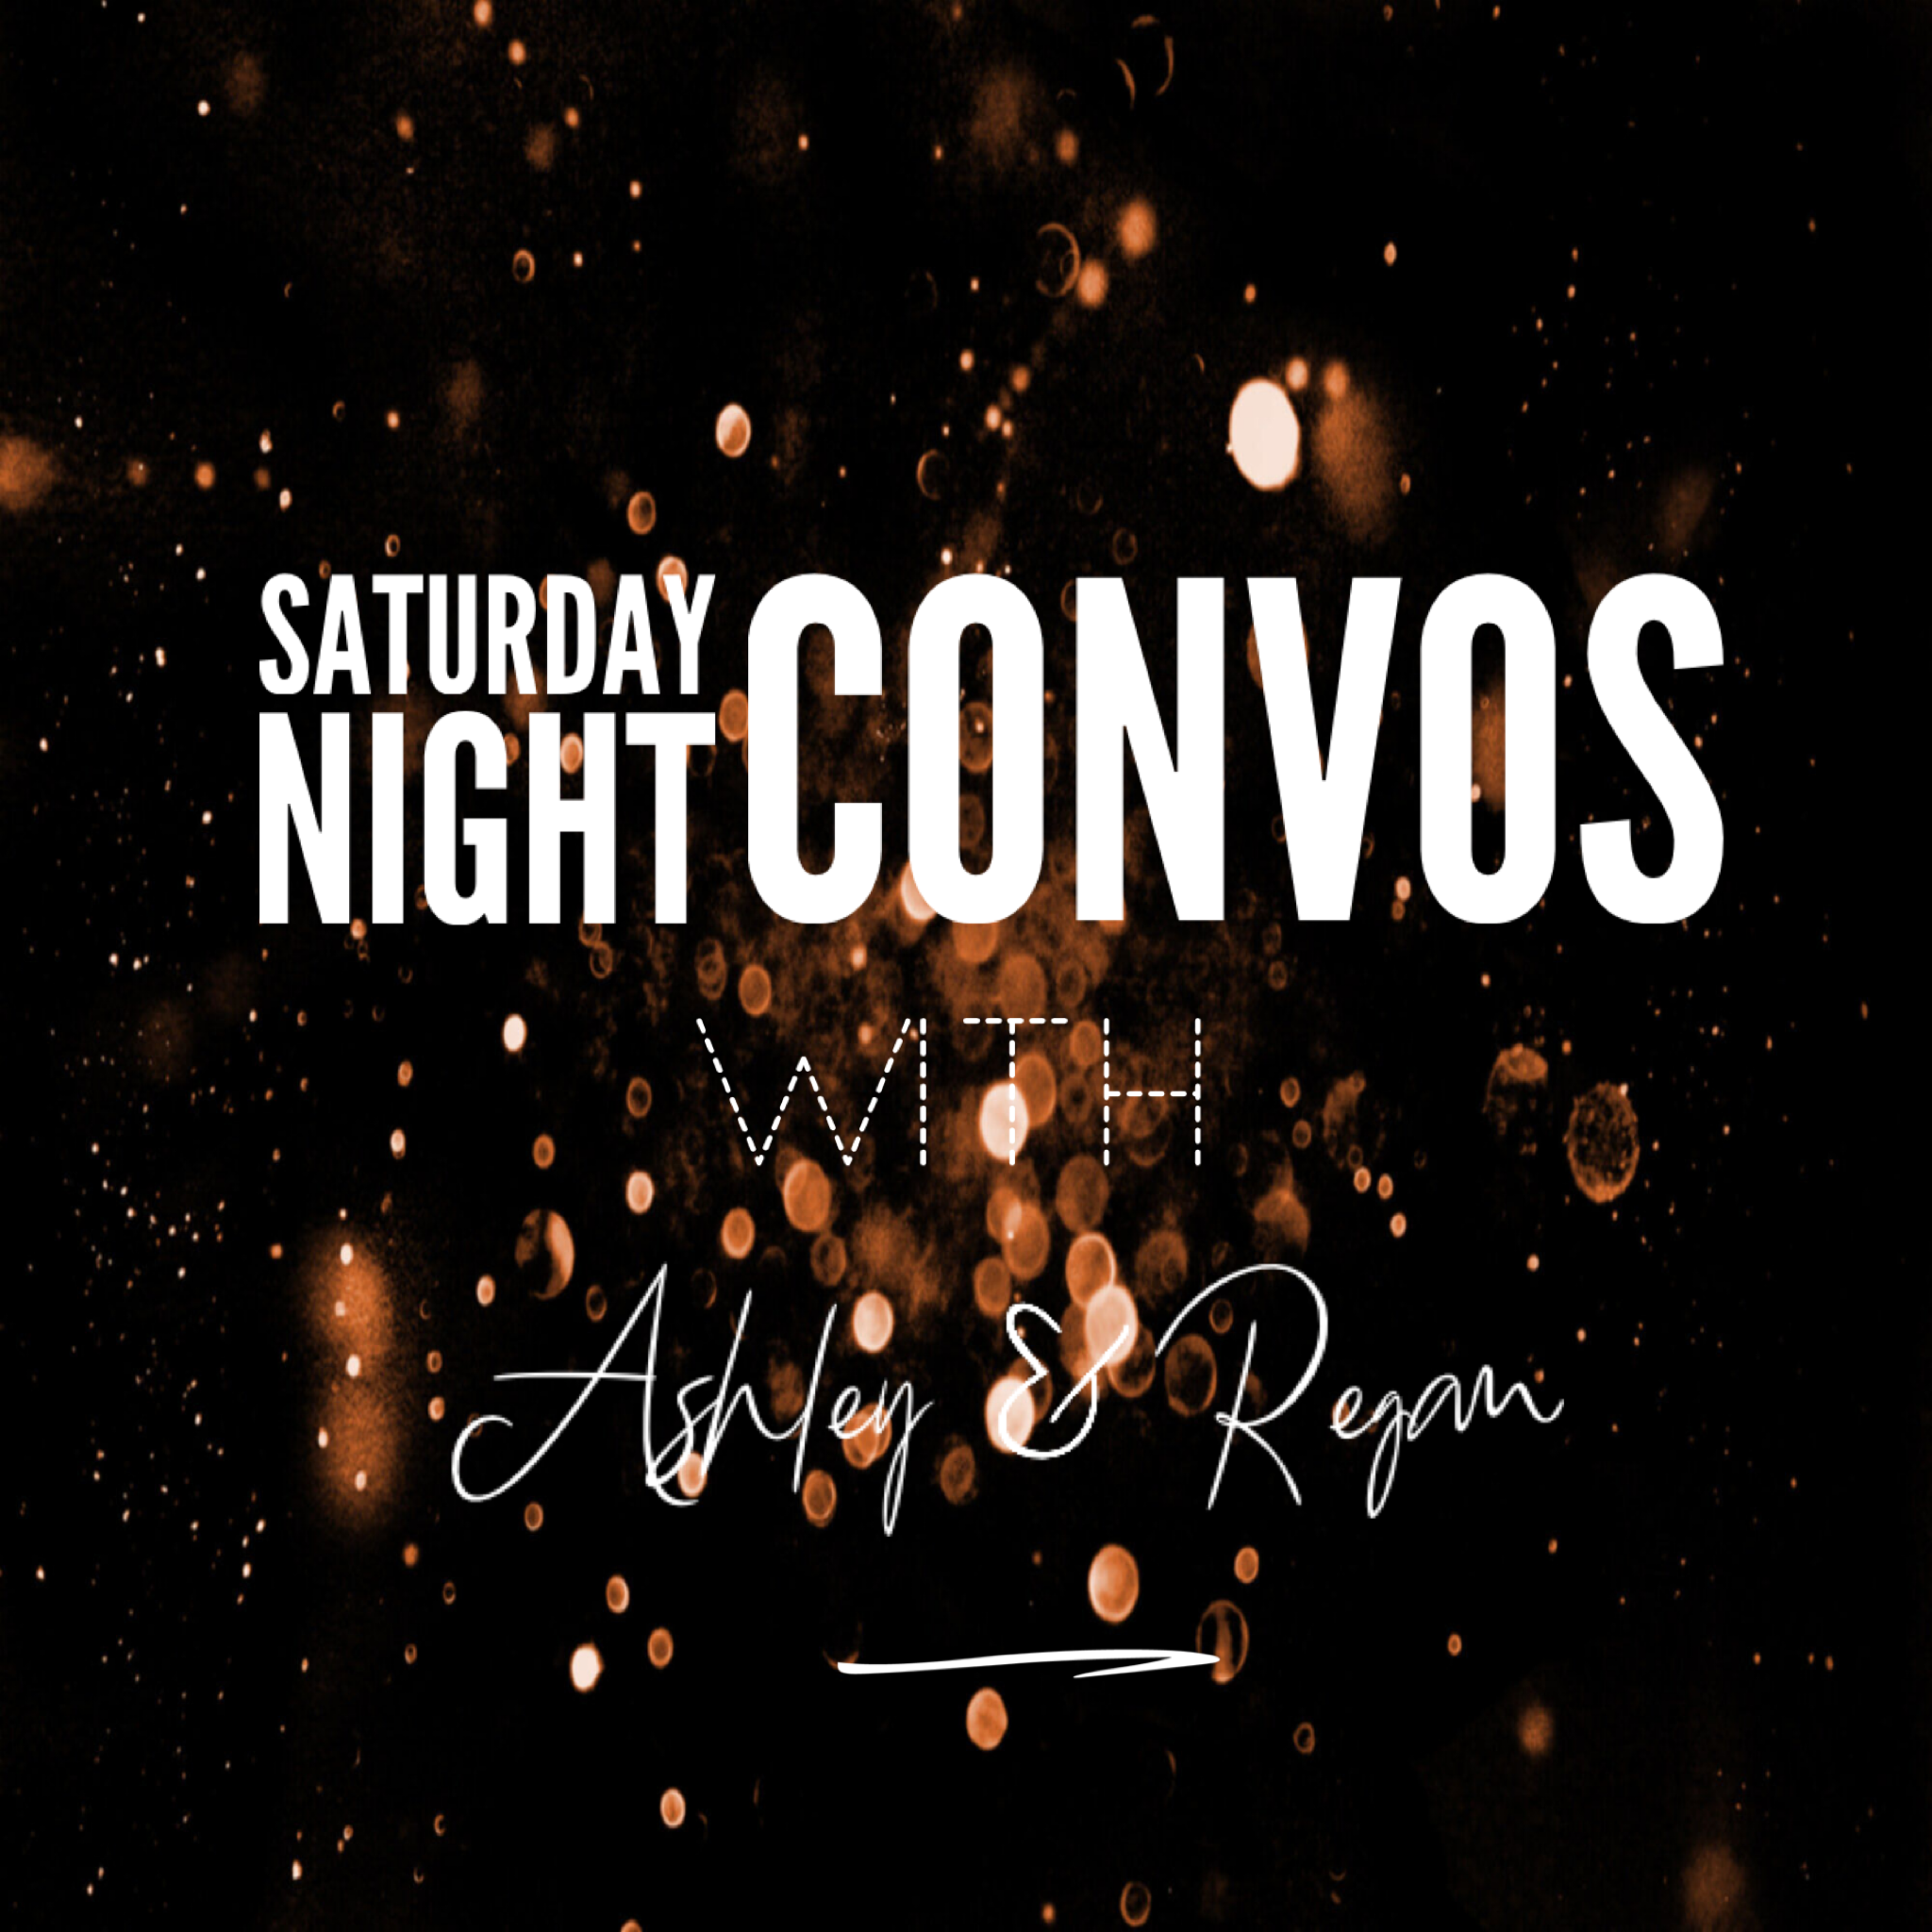 Saturday Night Convos